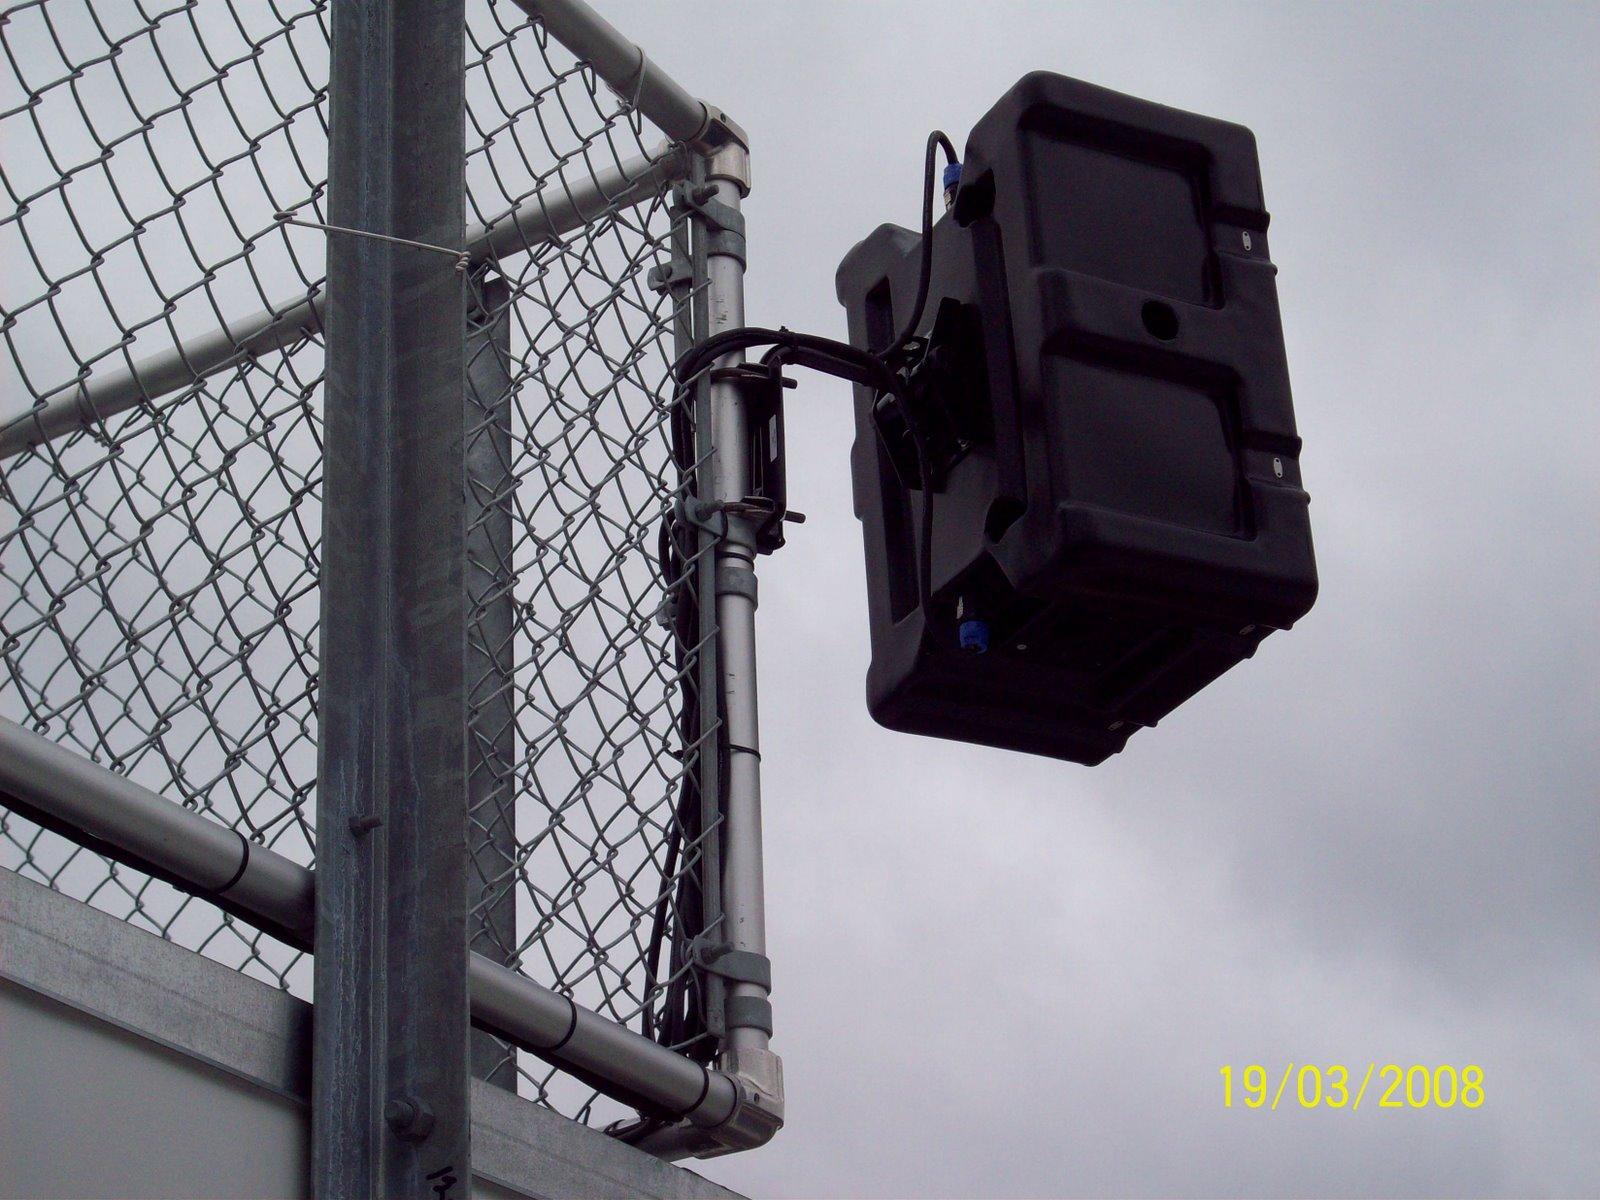 Technomad Noho C weatherproof loudspeakers